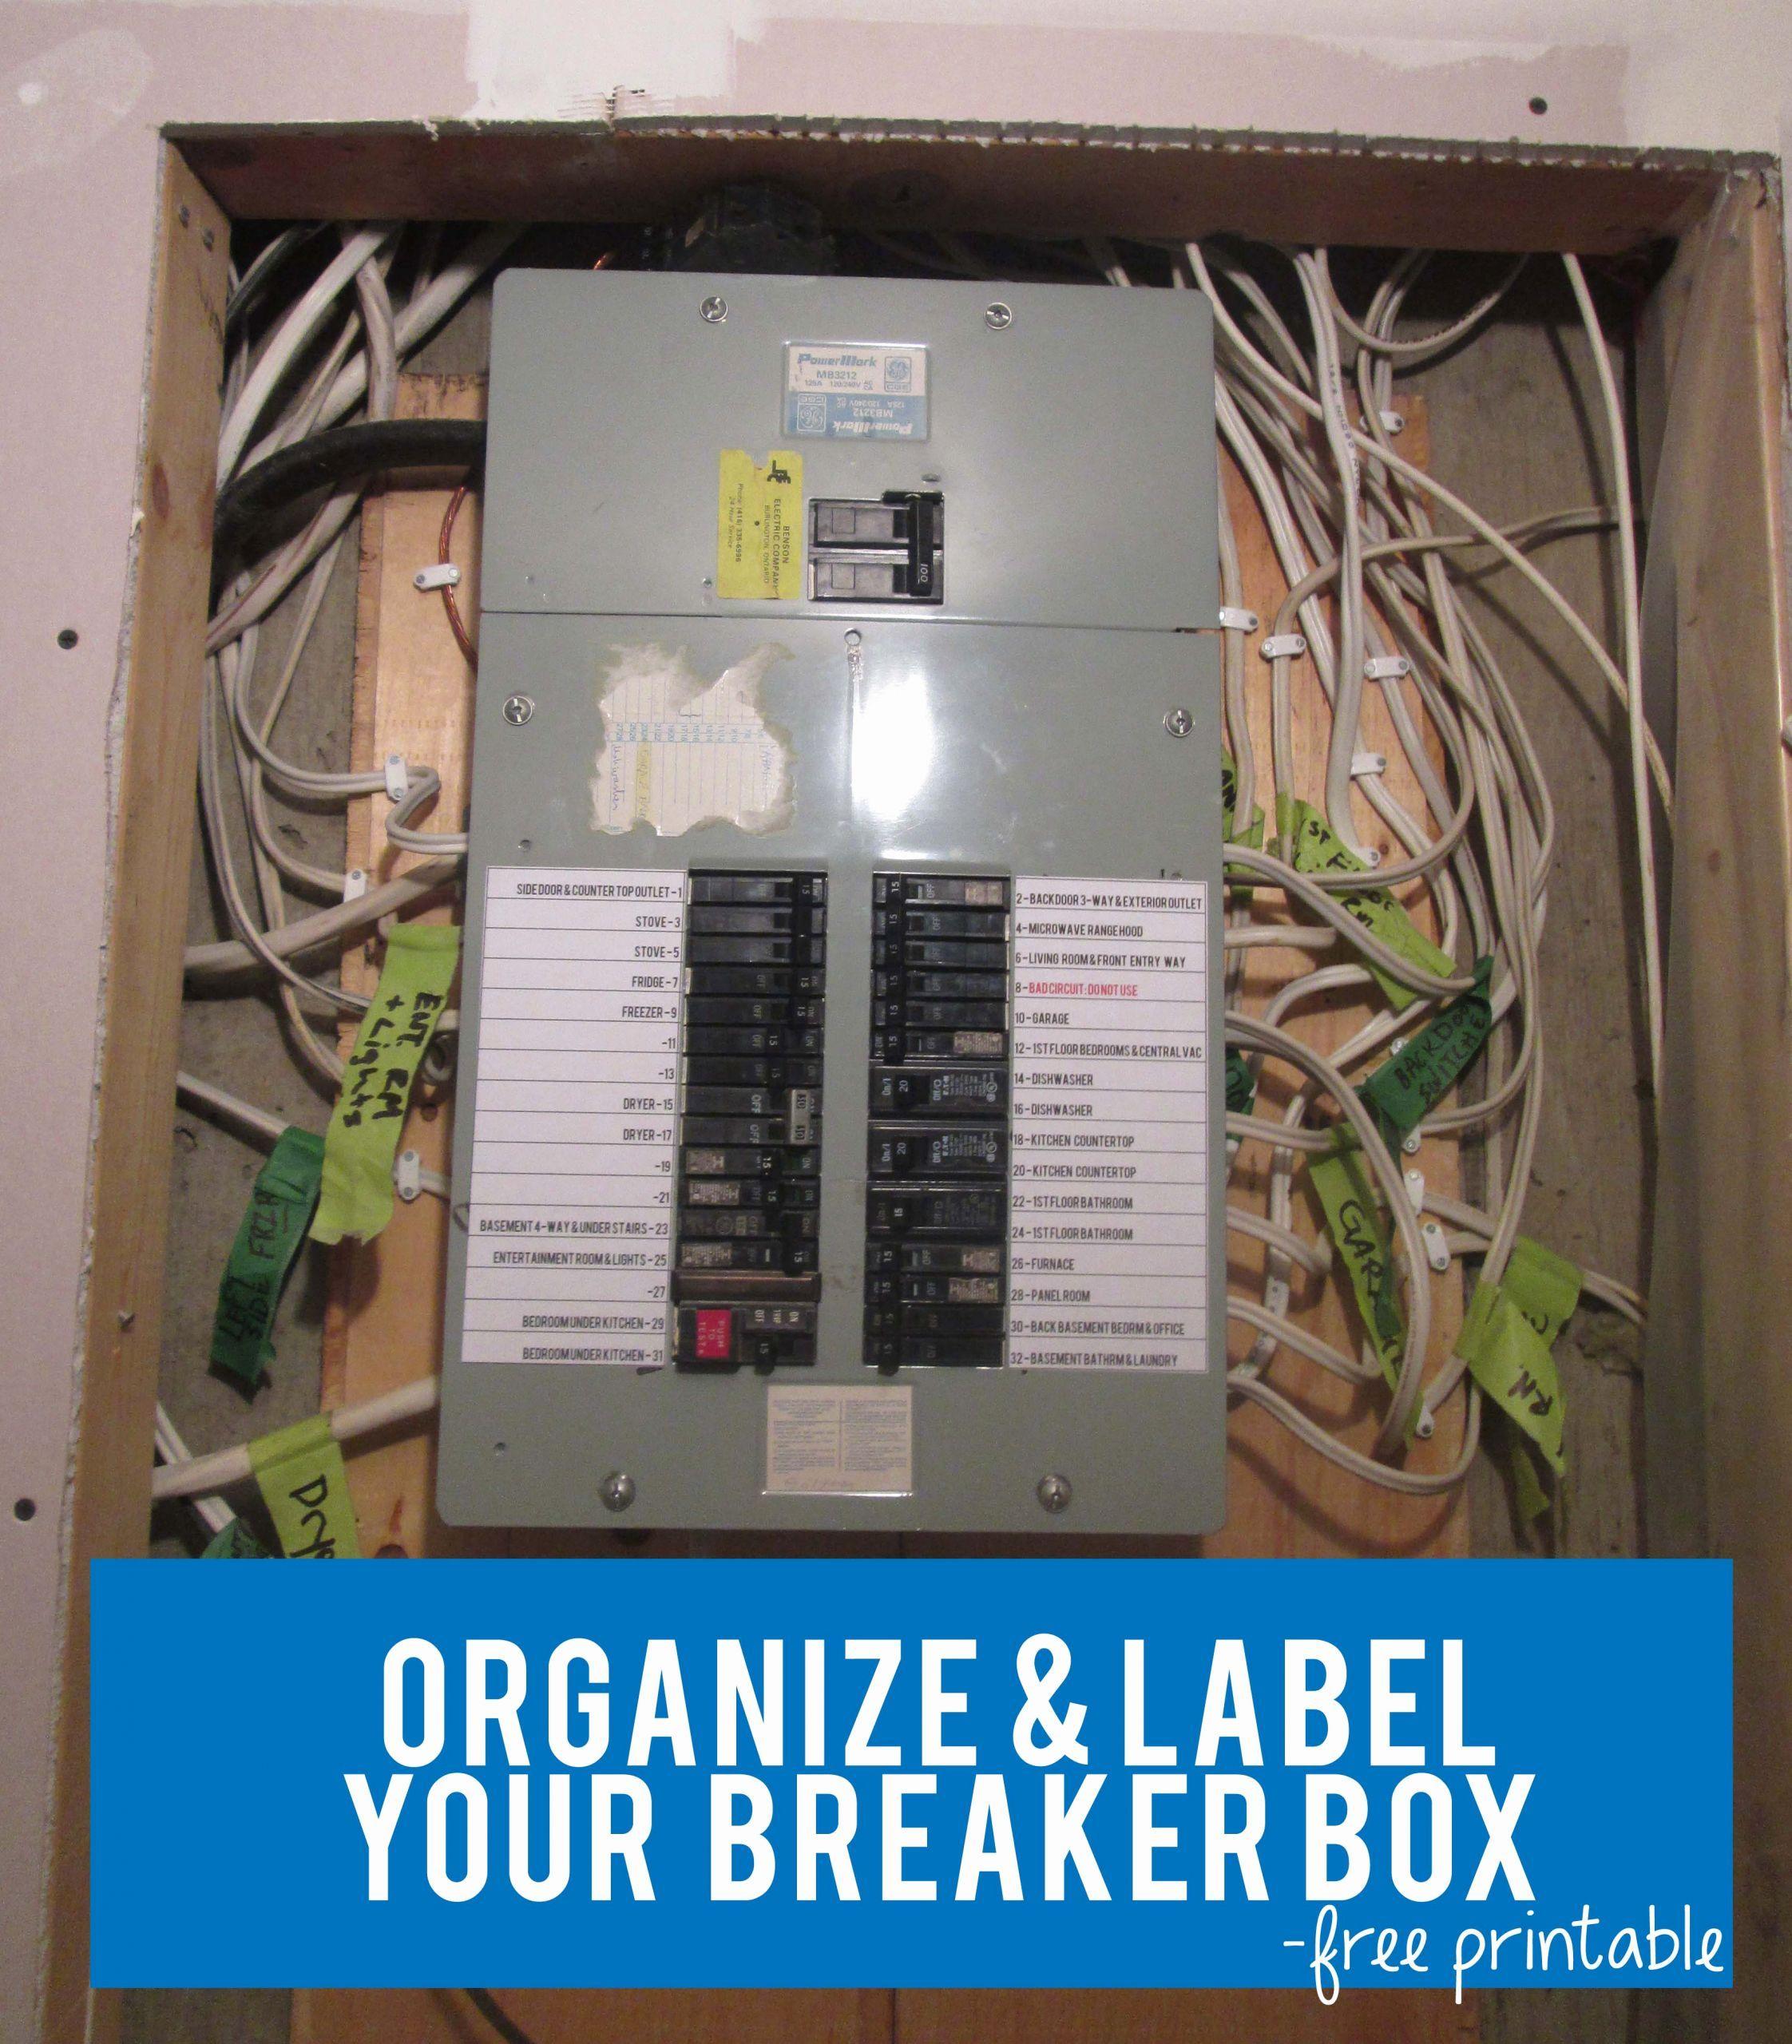 Circuit Breaker Panel Label Template Best Of Free Printable Circuit Breaker Panel Labels Made Label Templates Organizing Labels Return Address Labels Template